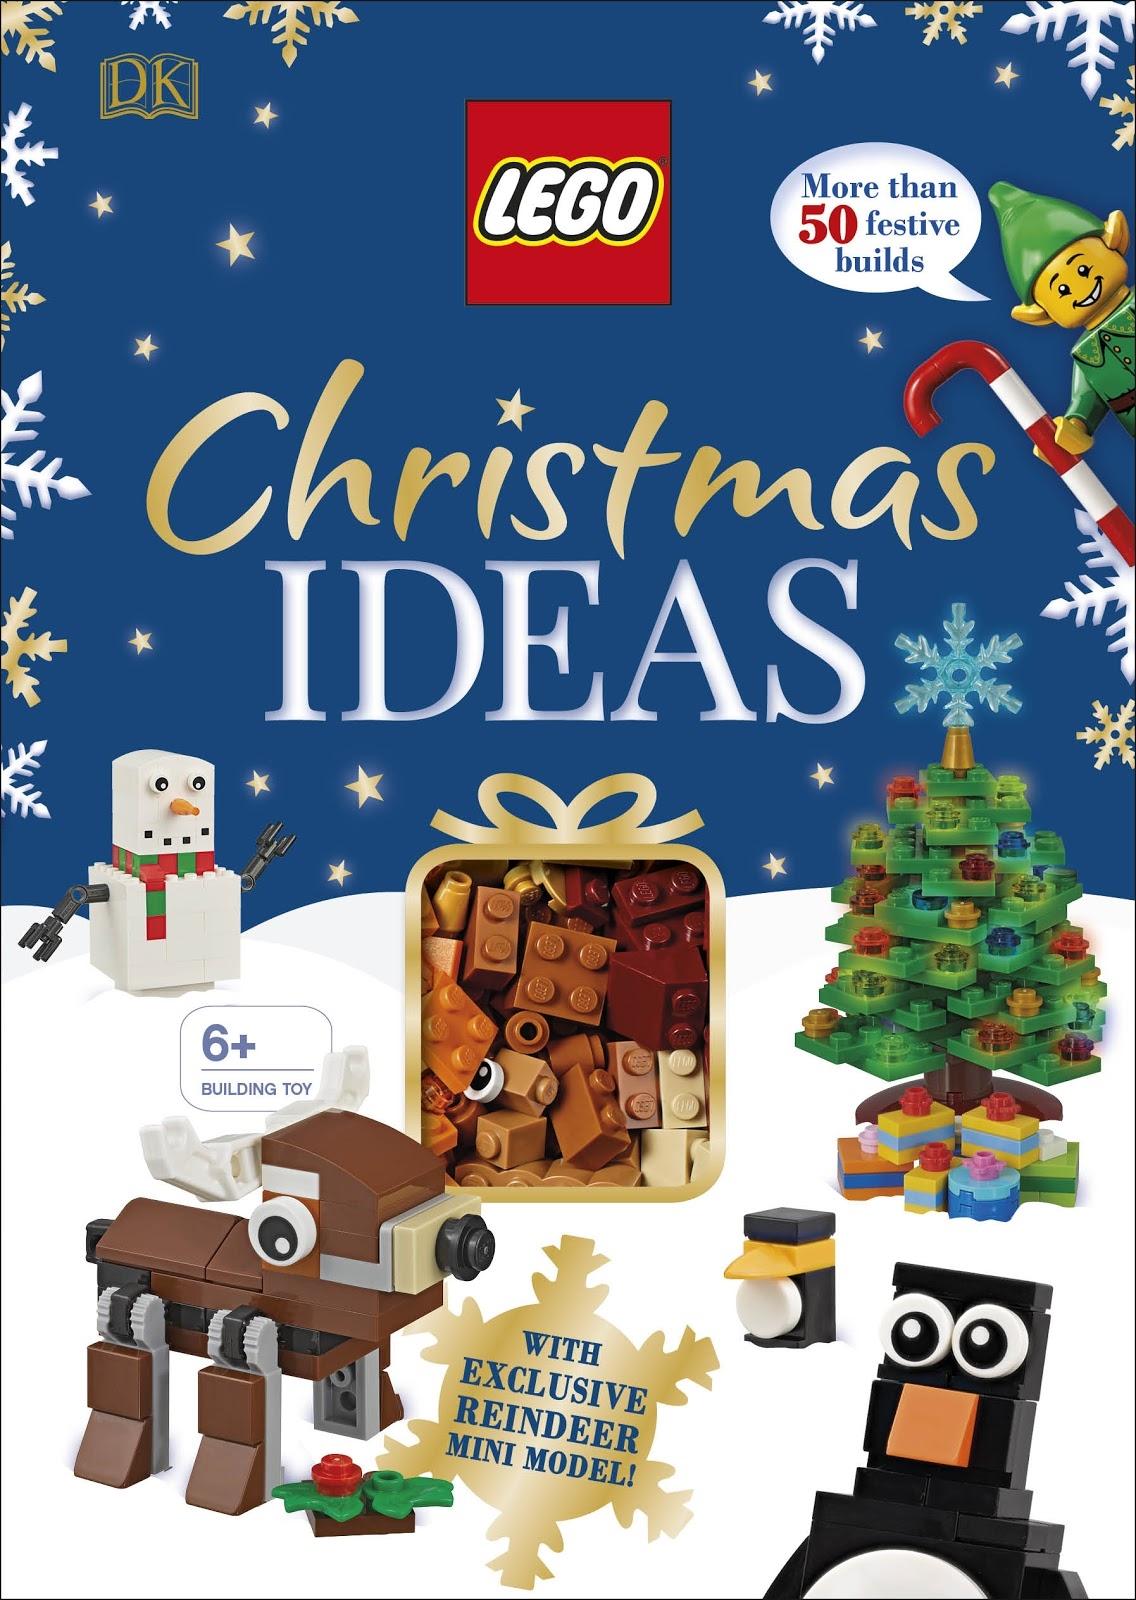 Lego Christmas.Lego Christmas Ideas By Dk Penguin Books Australia